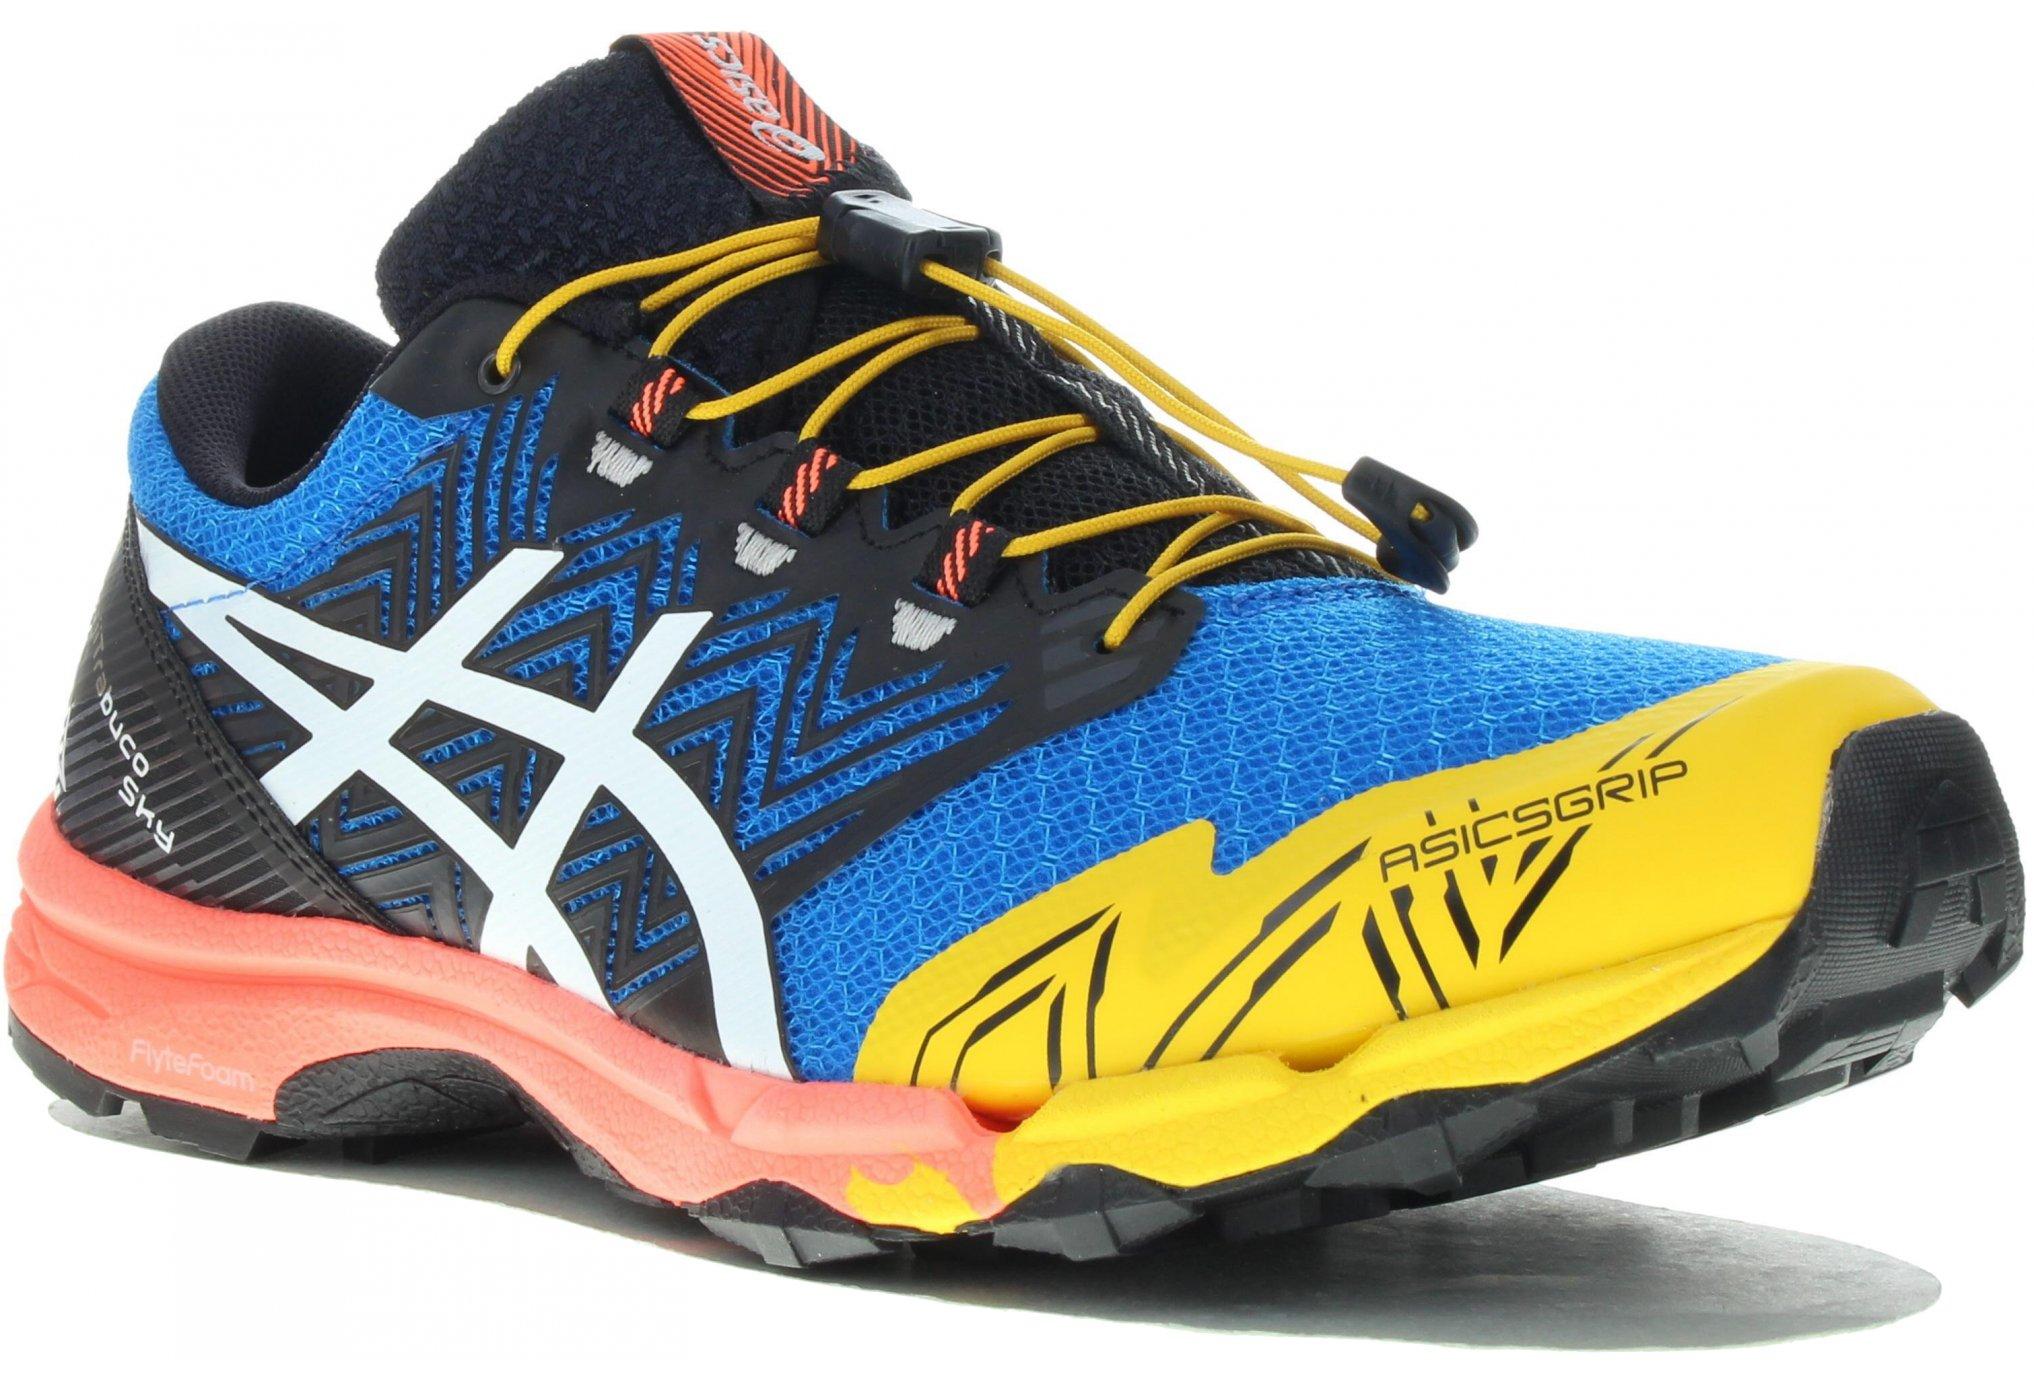 ASICS GEL FUJI TRABUCO SKY BLEUE Chaussures de trail